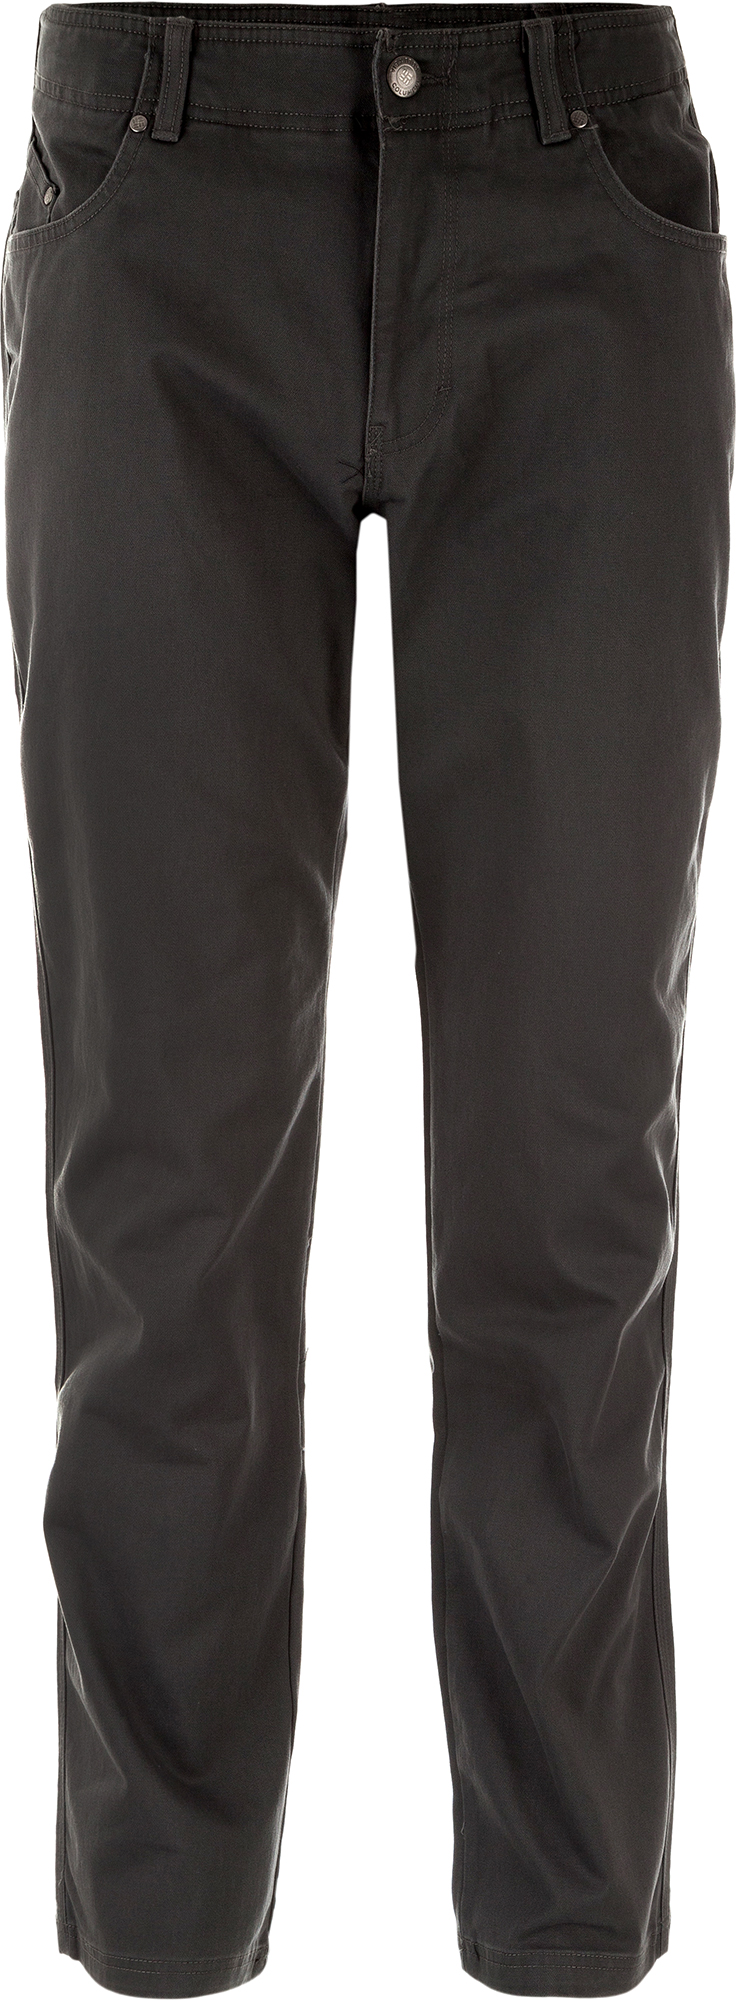 Columbia Брюки мужские Columbia Pilot Peak брюки мужские классические